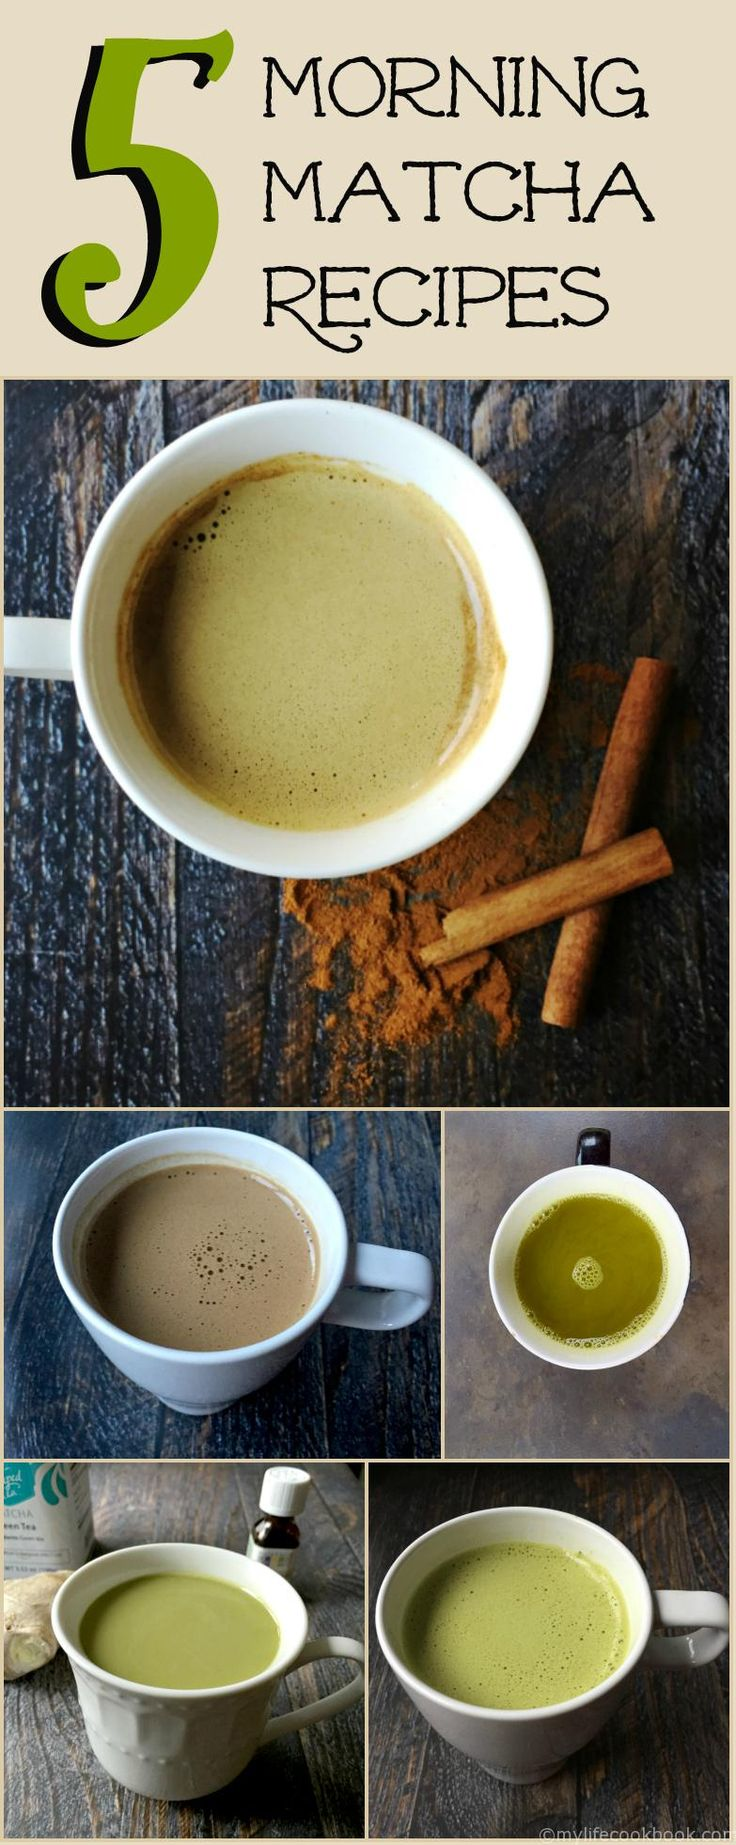 Morning Matcha Round-Up #dan3330 http://livedan330.com/2015/08/02/5-morning-matcha-recipes/